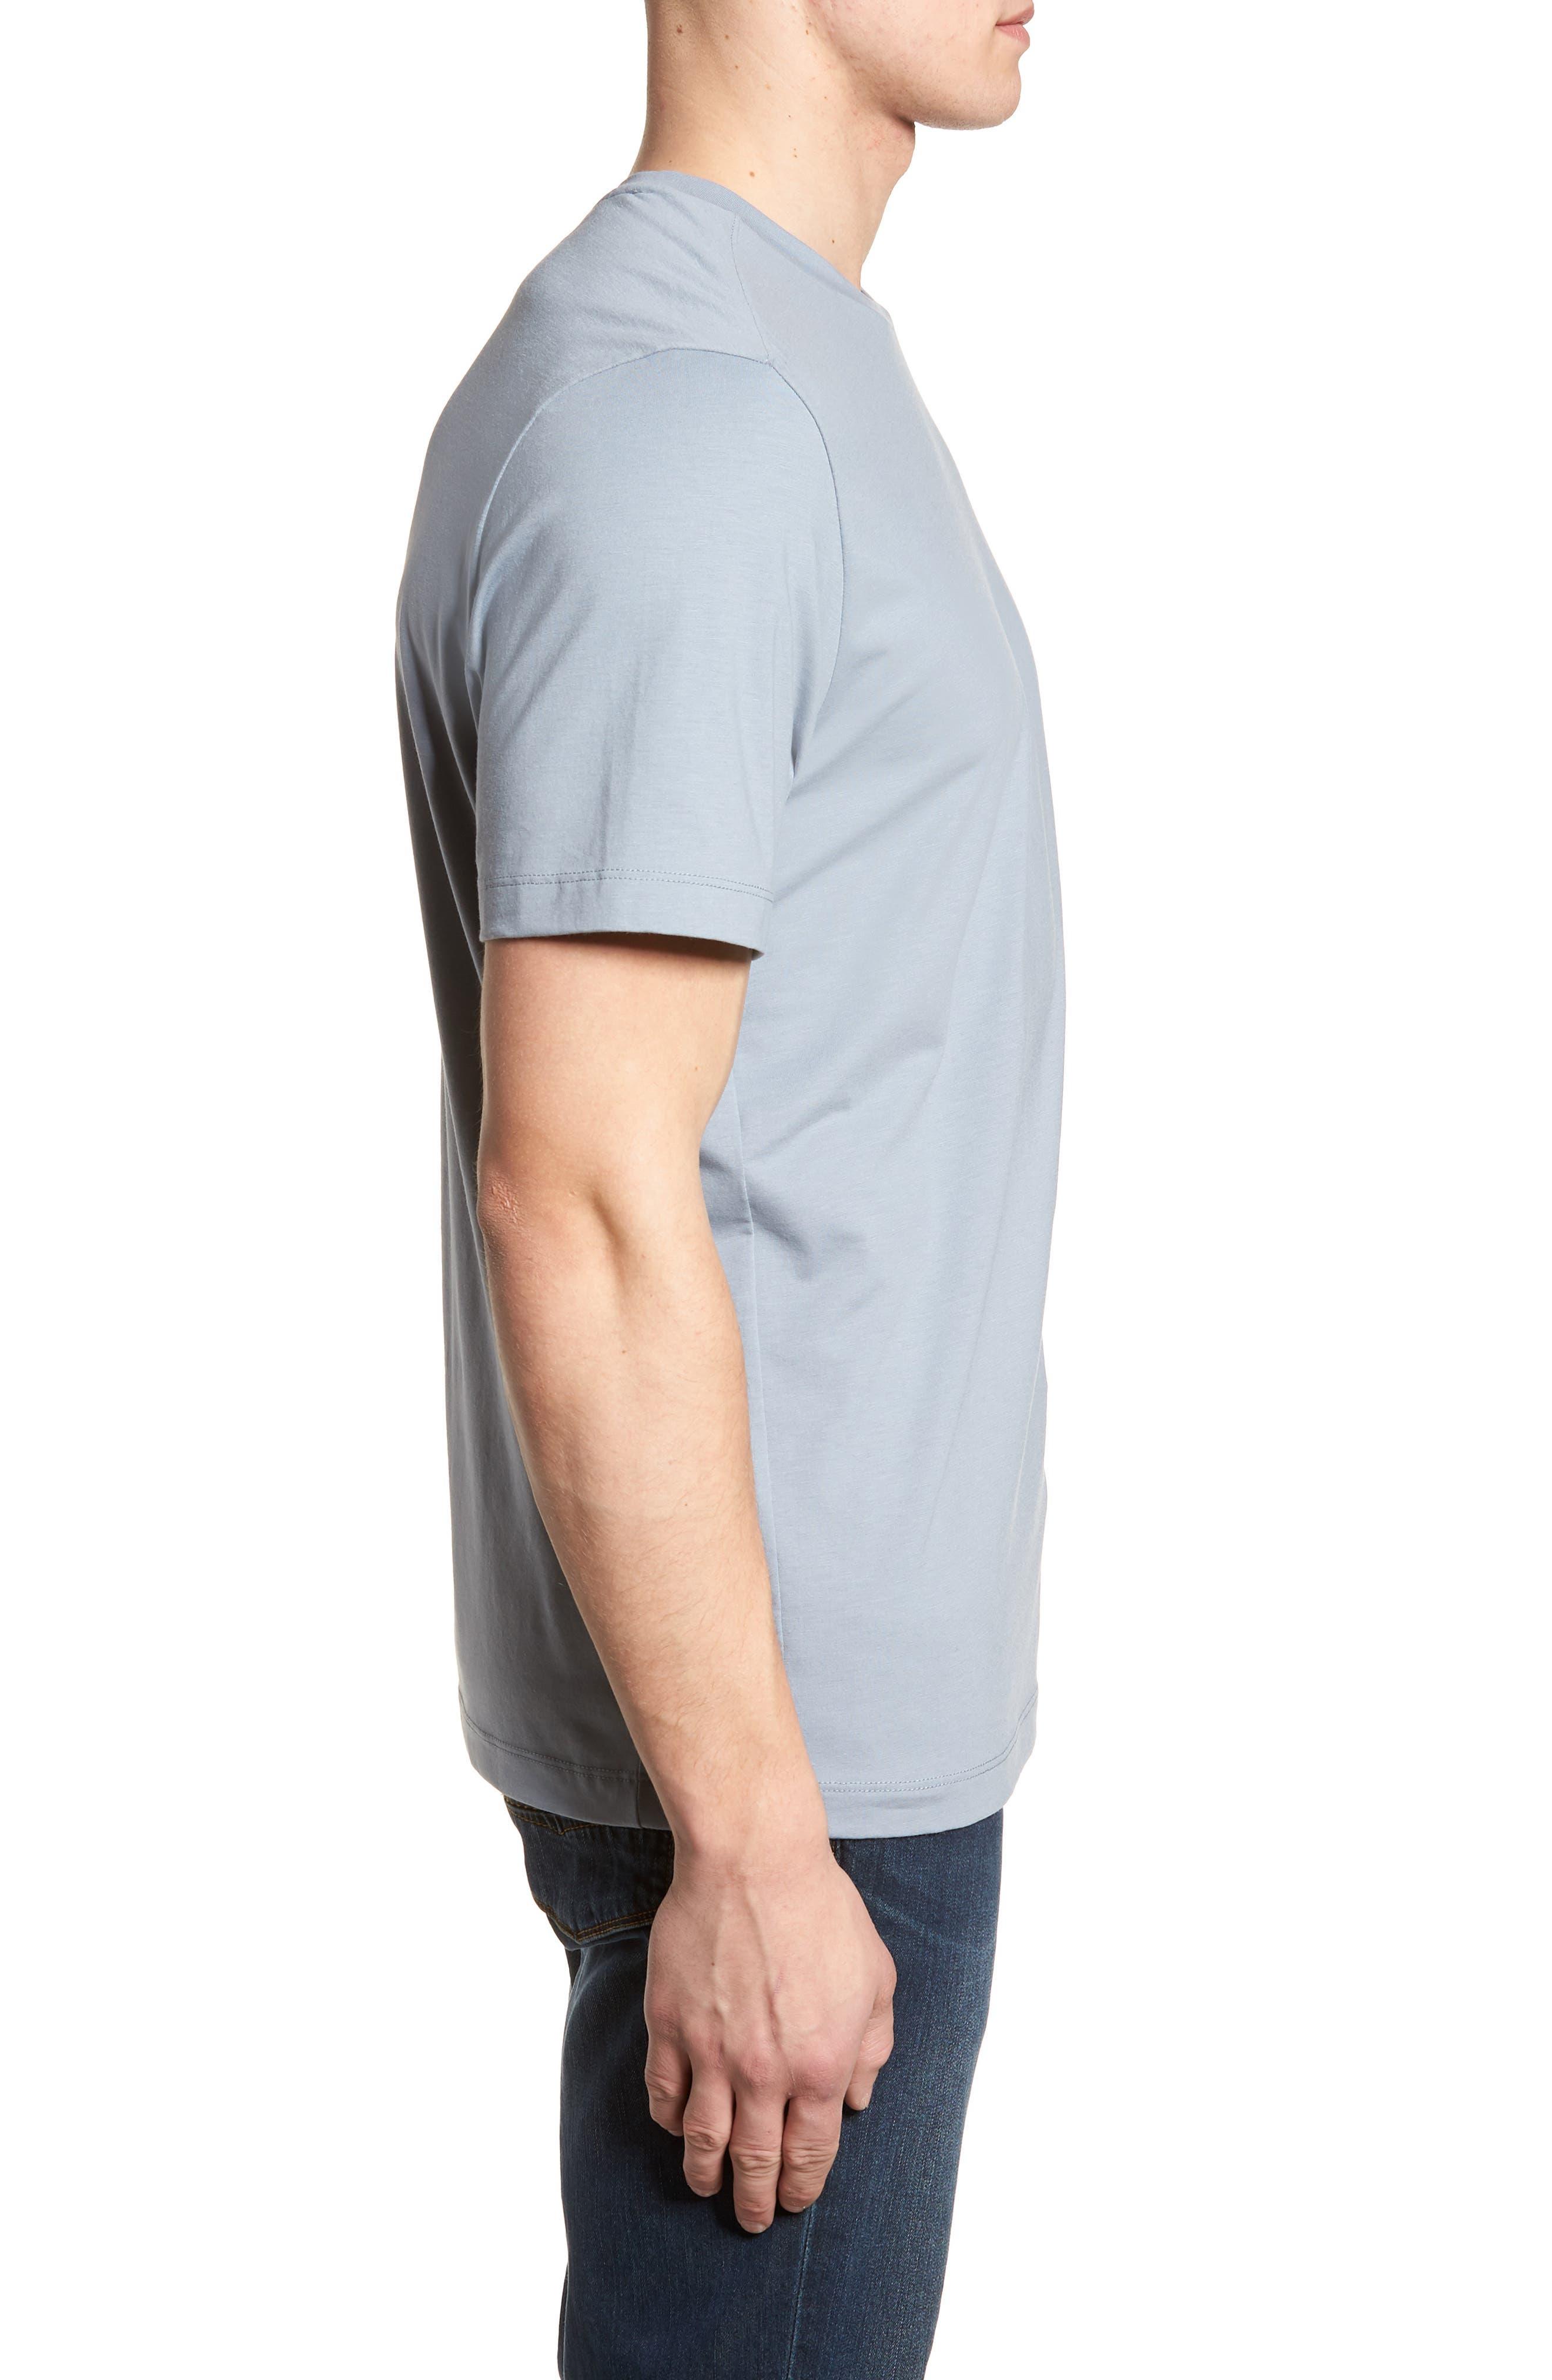 Tropicool T-Shirt,                             Alternate thumbnail 3, color,                             050